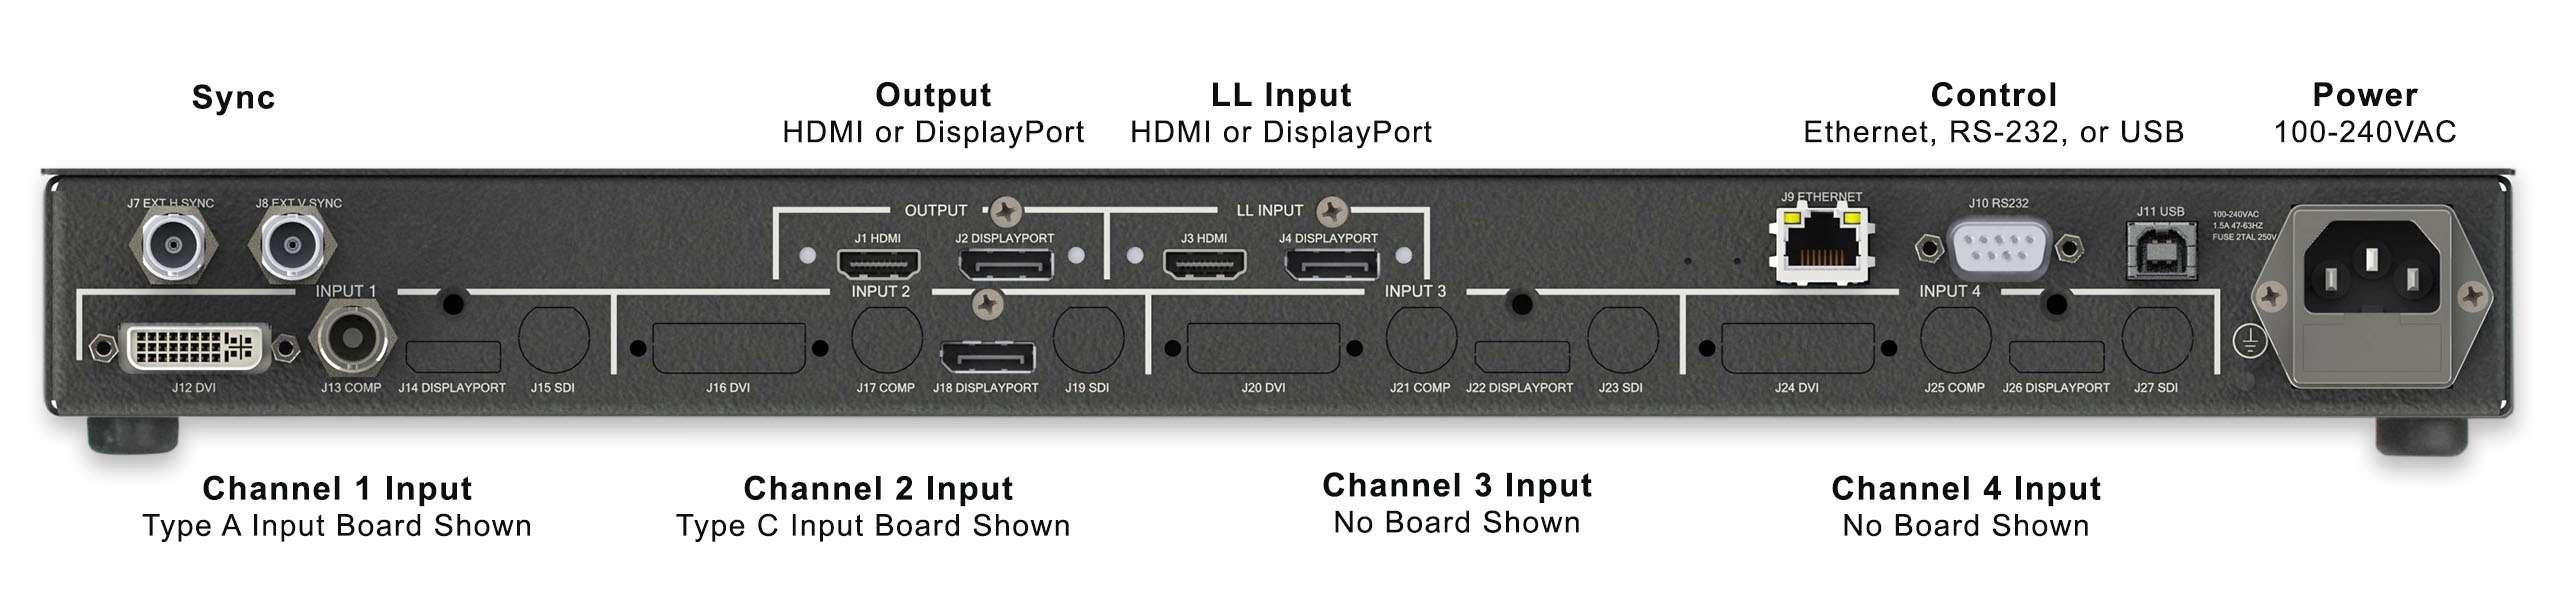 EZwindow4KE inputs and outputs - back view